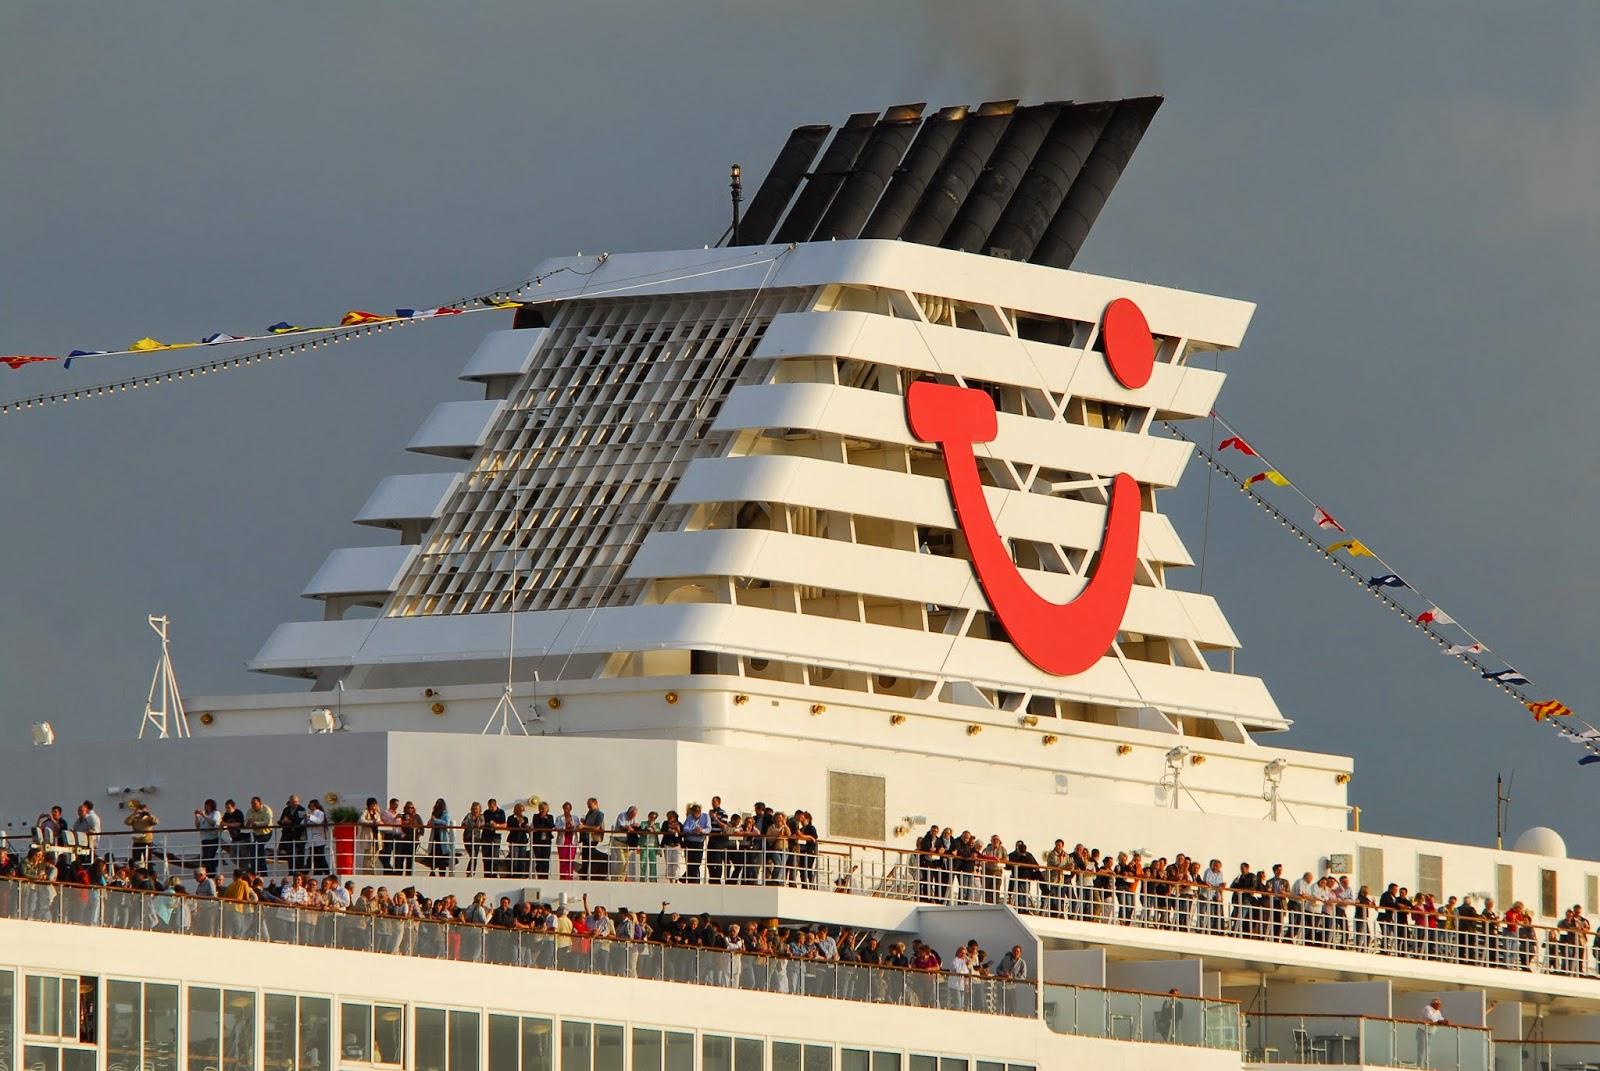 Kiel Wasser Tui Cruises Taufe Der Mein Schiff 4 In Kiel